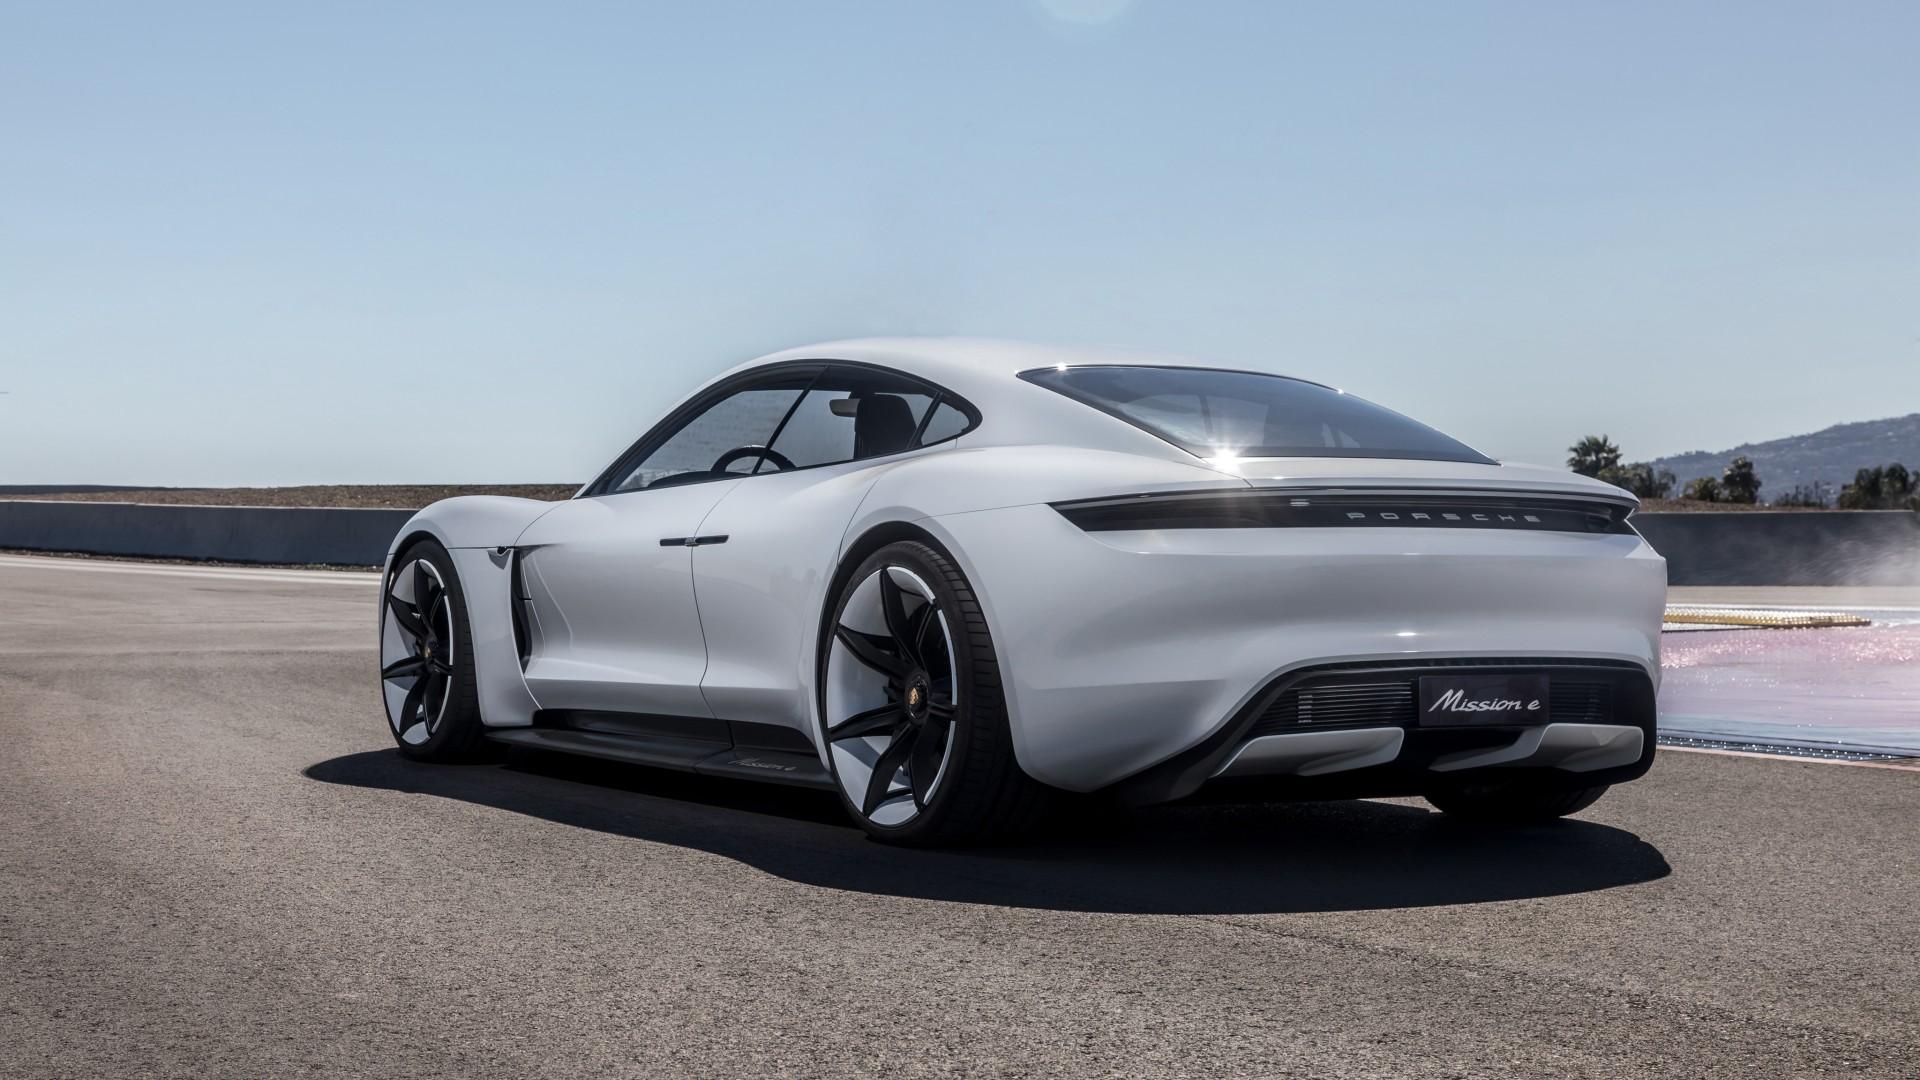 Porsche Mission E Concept 4k Wallpaper Hd Car Wallpapers